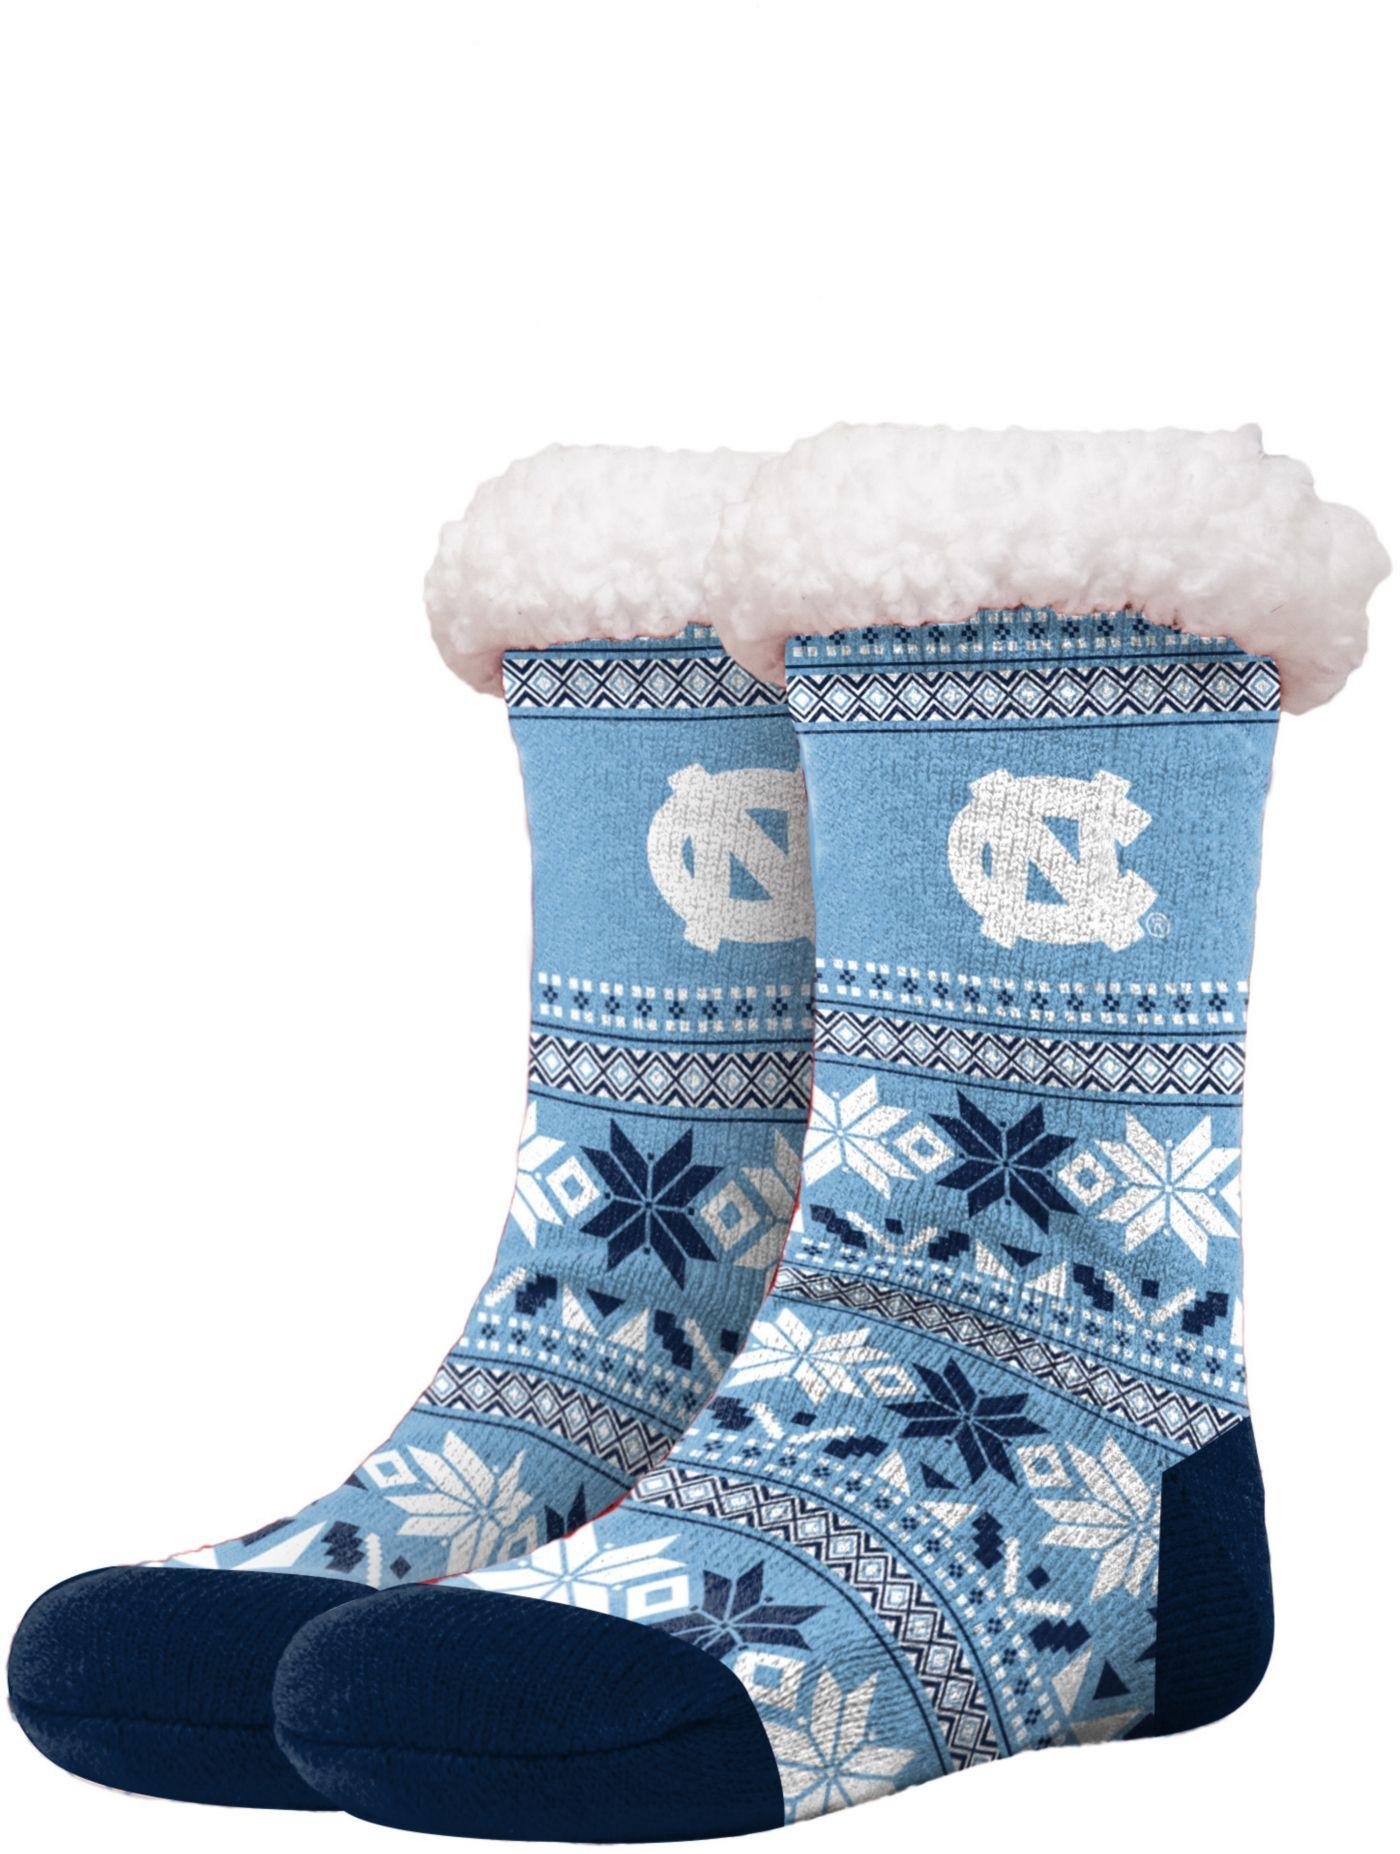 FOCO North Carolina Tar Heels Footy Slippers